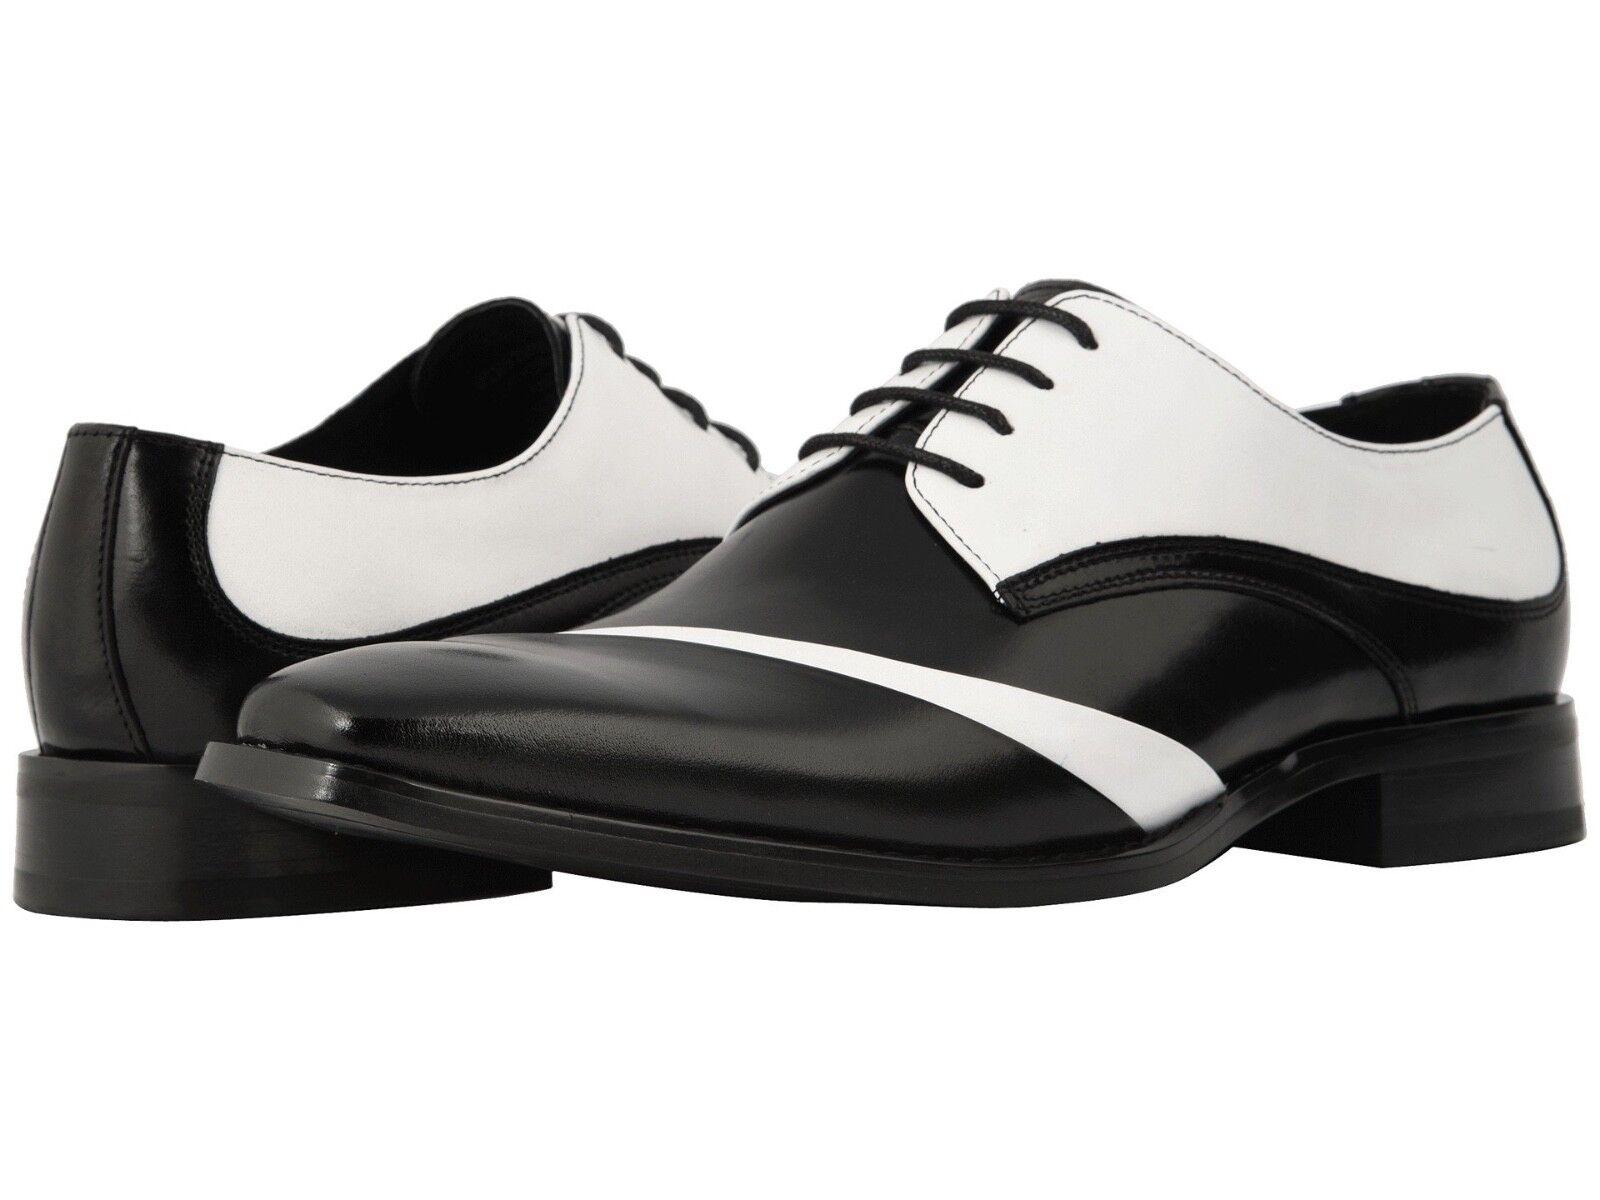 Stacy Adams Talmadge Men's Folded Vamp Dress shoes Black Black Black White 25193-111 29c930